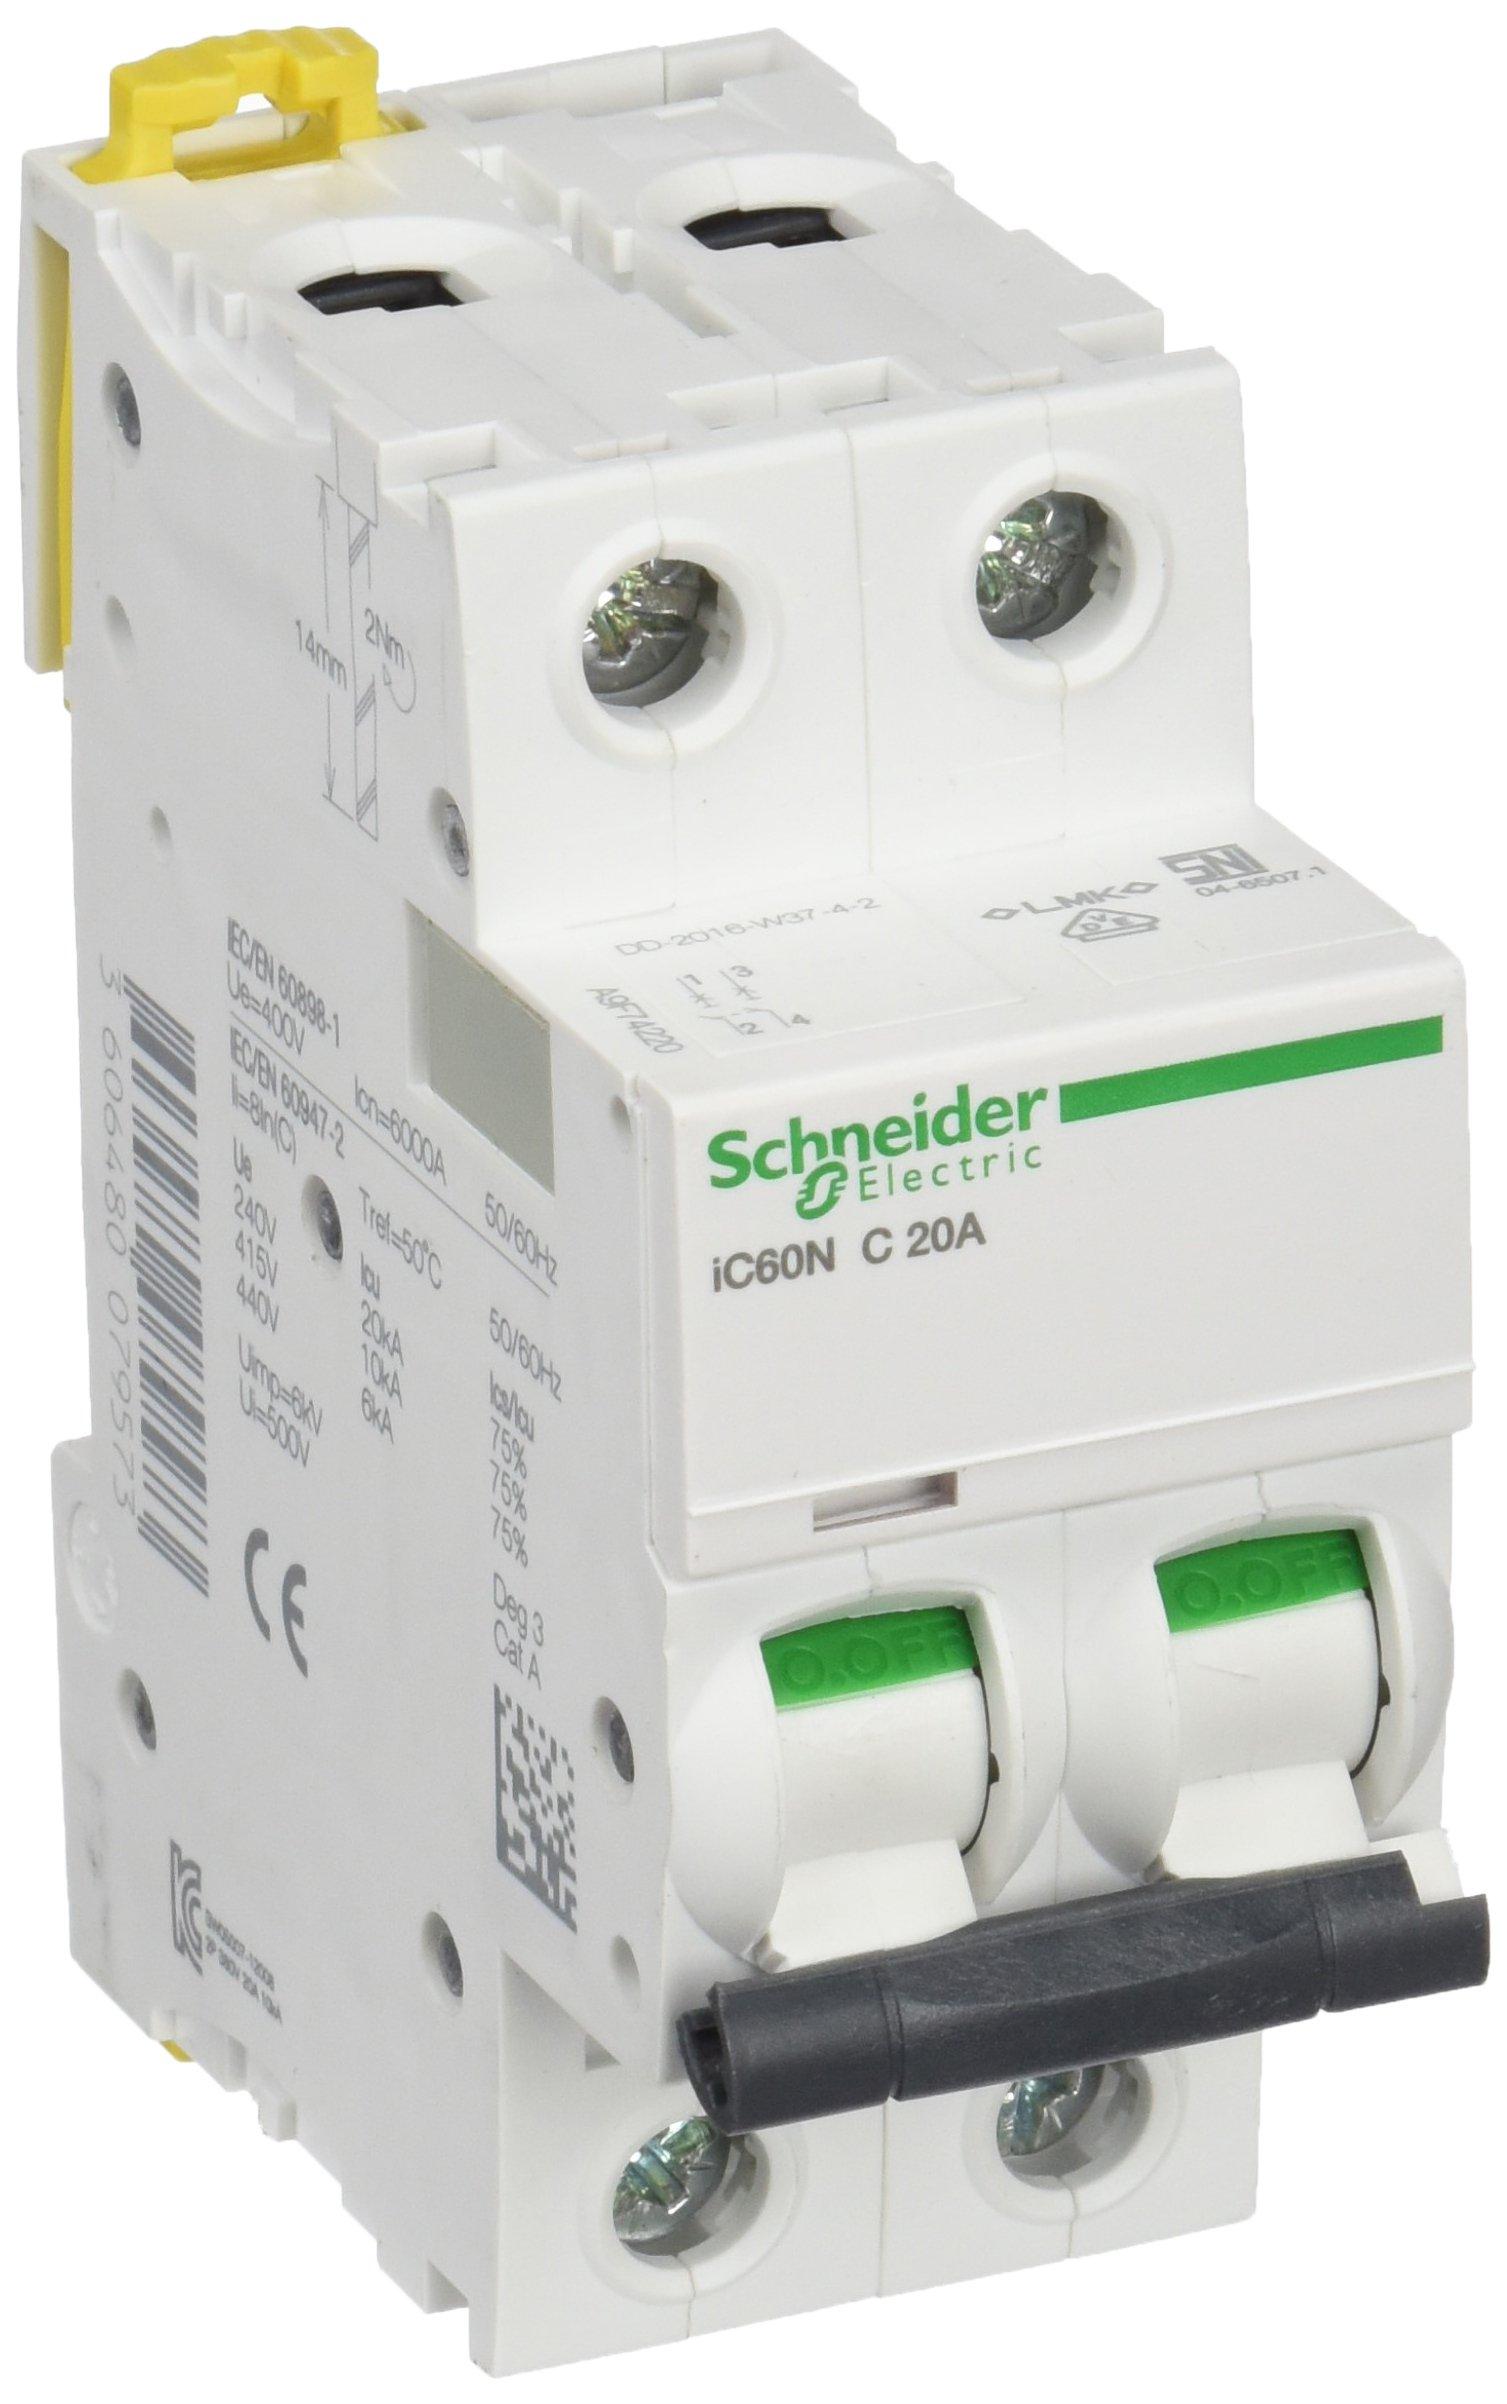 Schneider A9F74220 iC60N 2P 20A C MCB Miniature Circuit Breaker, White, Set of 6 Piece